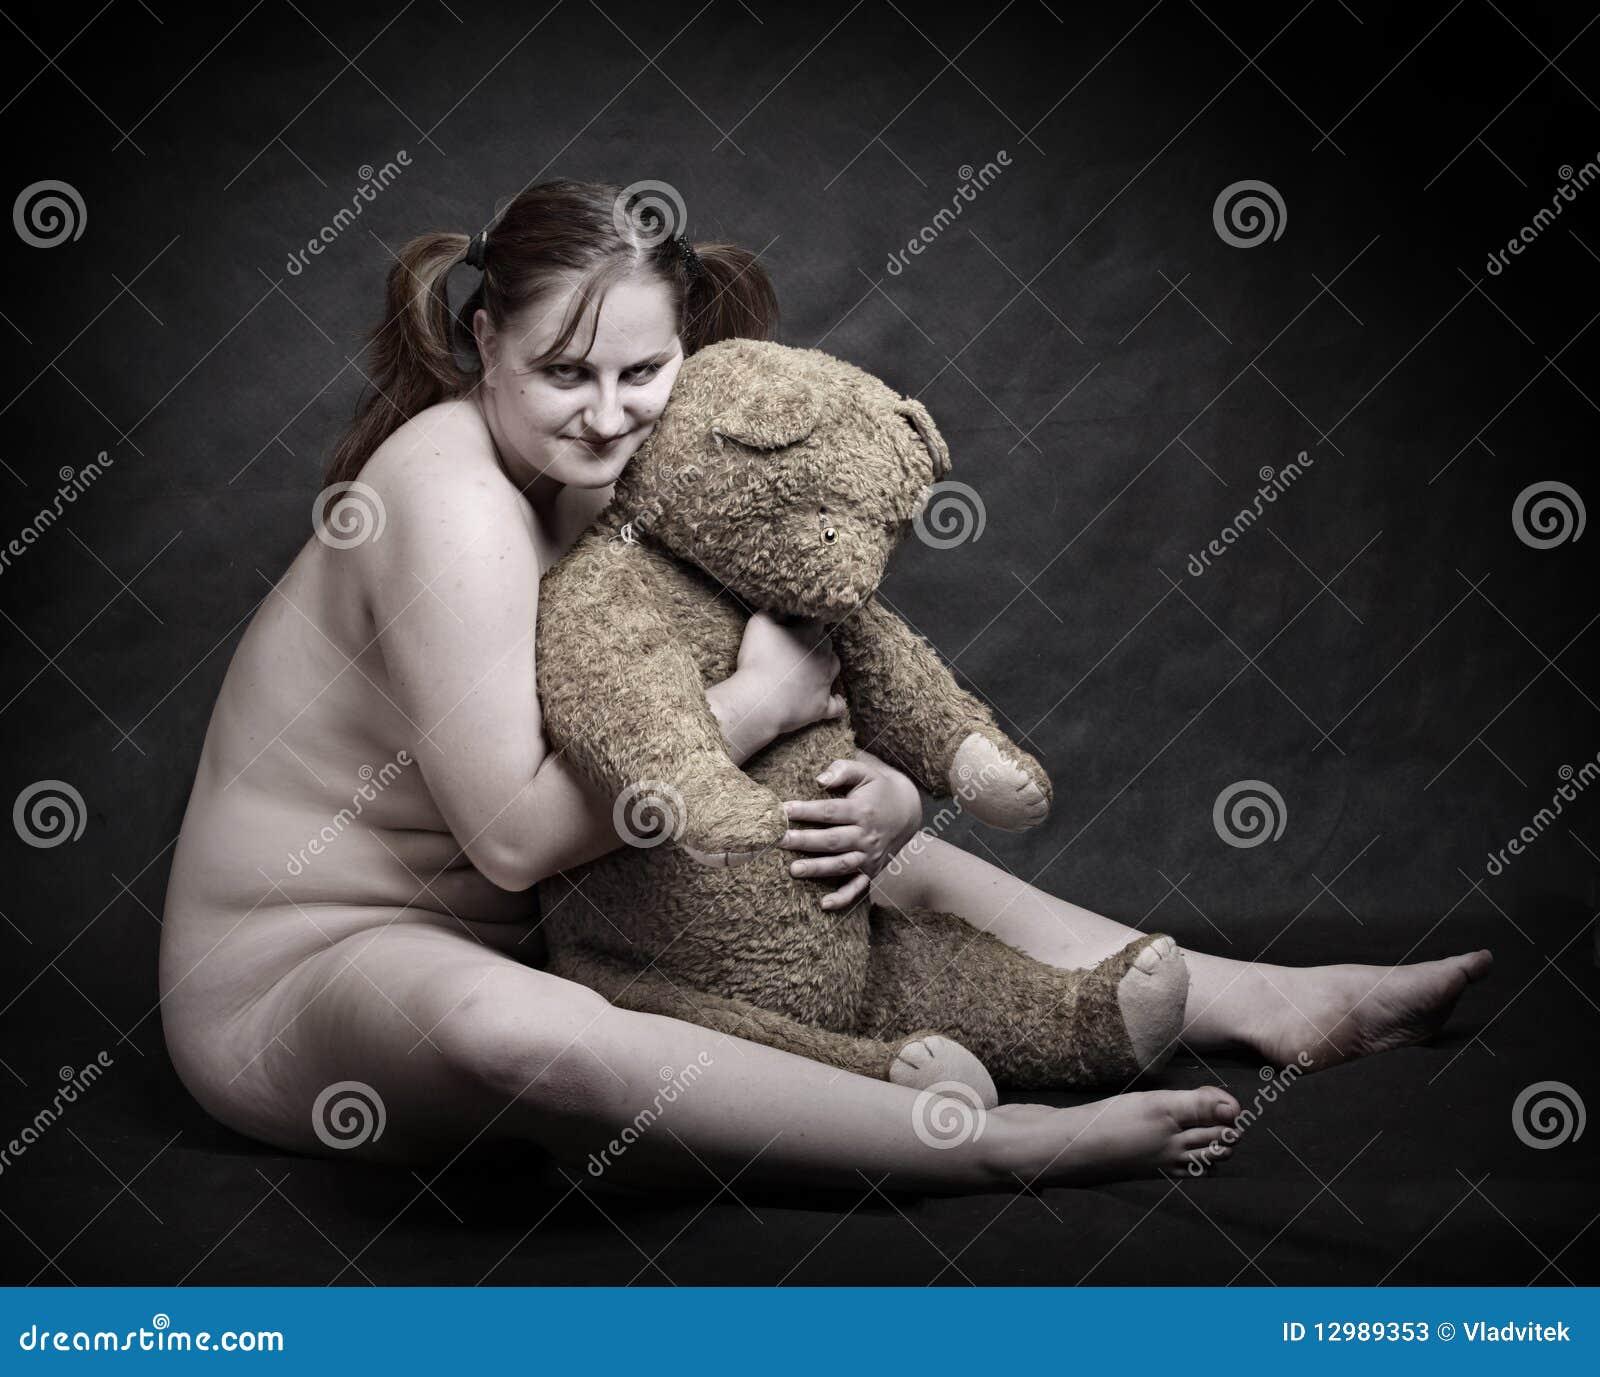 Big boob mature women getting laid